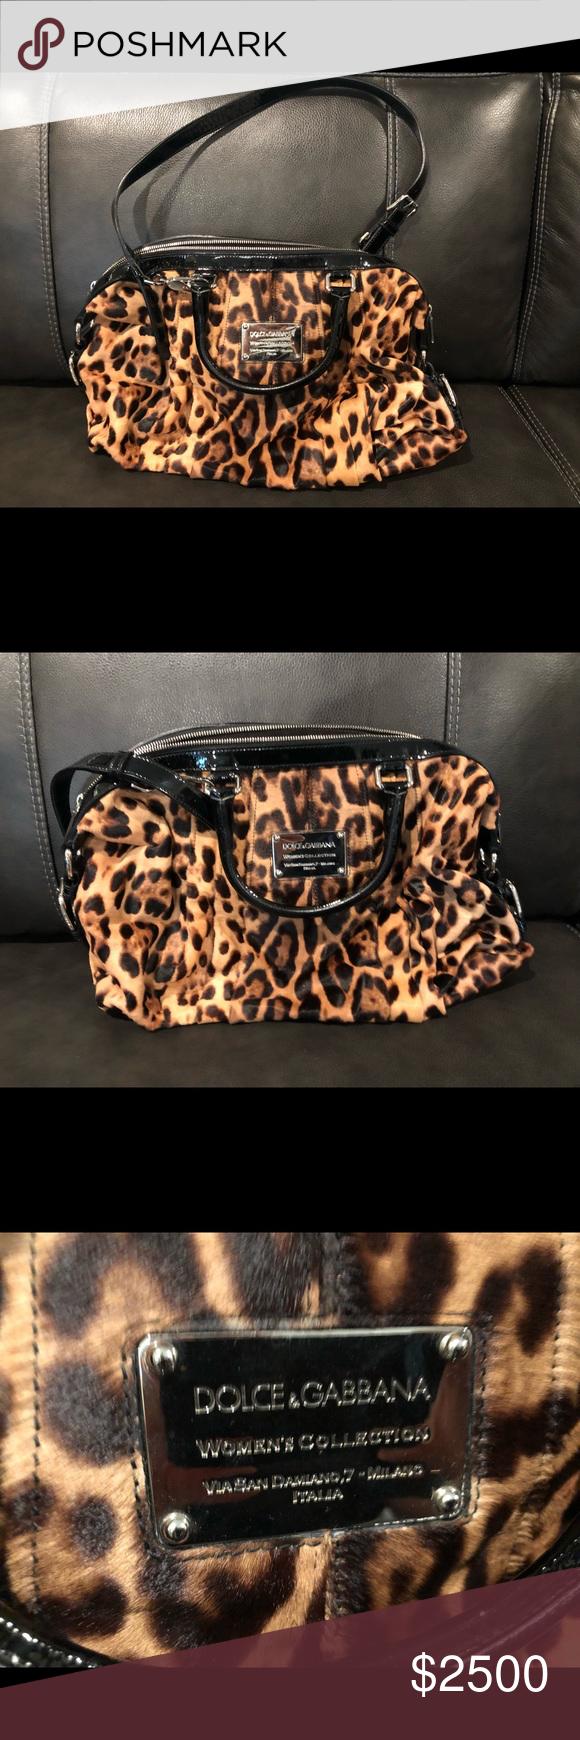 73200943b639 Genuine & Vintage Dolce&Gabbana Miss Urbanette Authentic Genuine & Vintage  Dolce&Gabbana Leopard Print Miss Urbanette Beige Calfhair & Fabric Satchel  ...